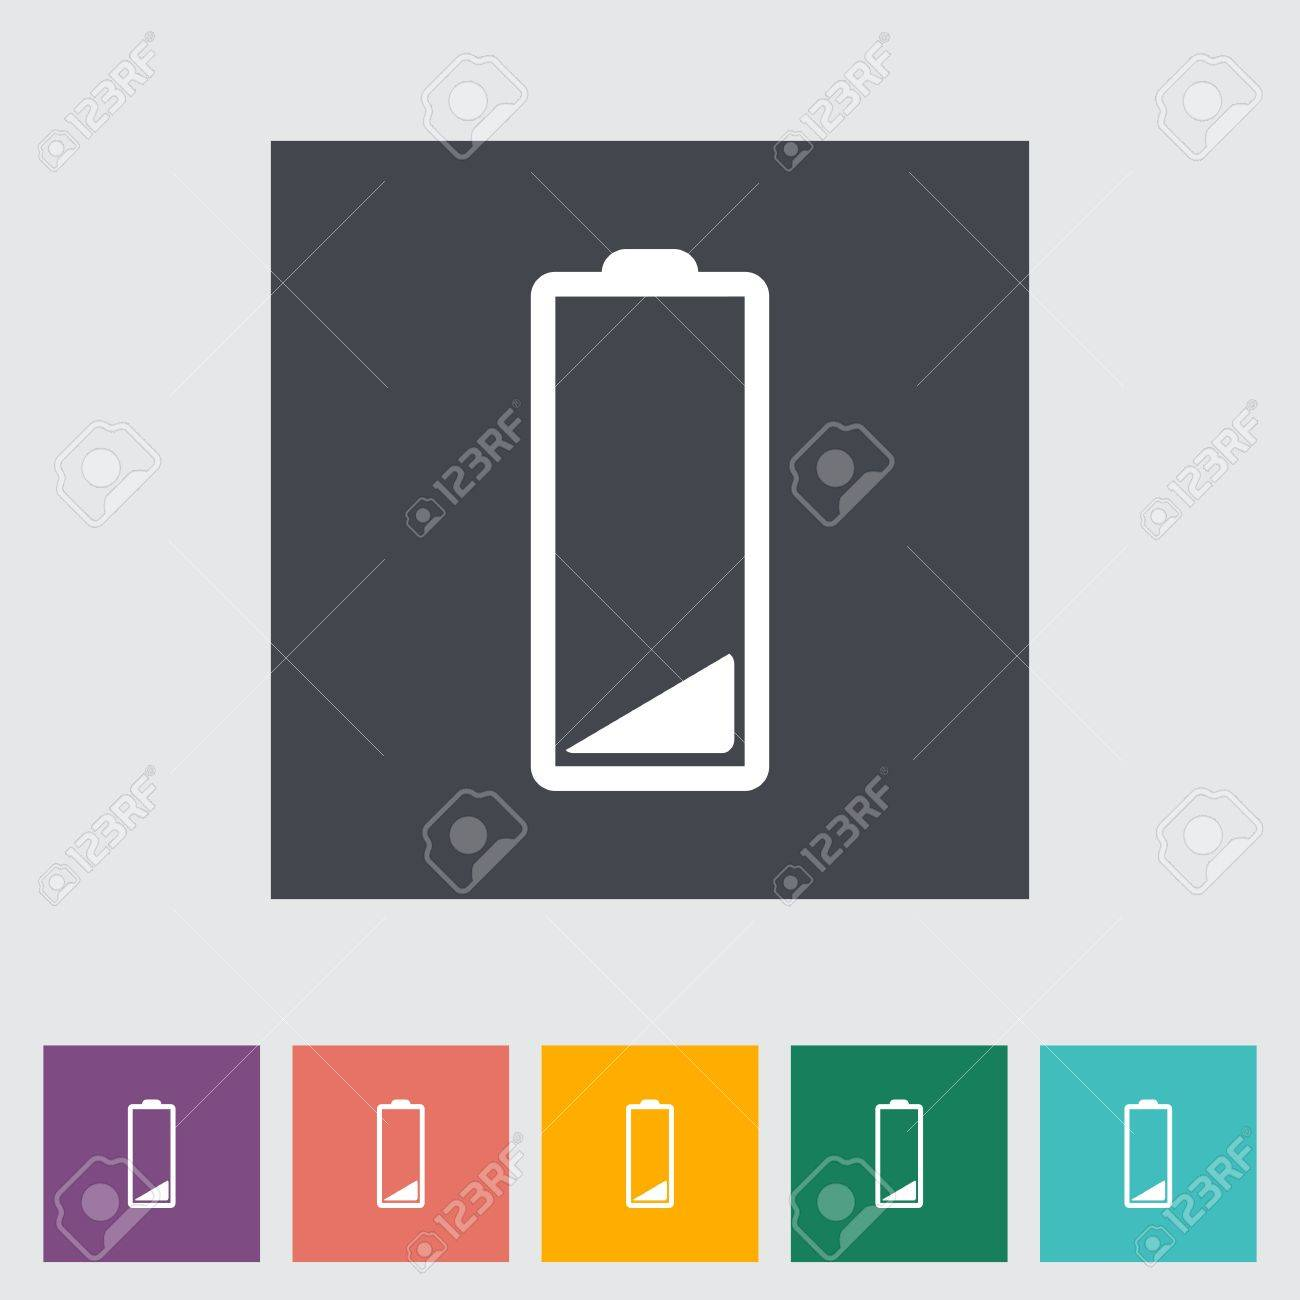 Charging the battery, flat single icon. Vector illustration. Stock Illustration - 21190646